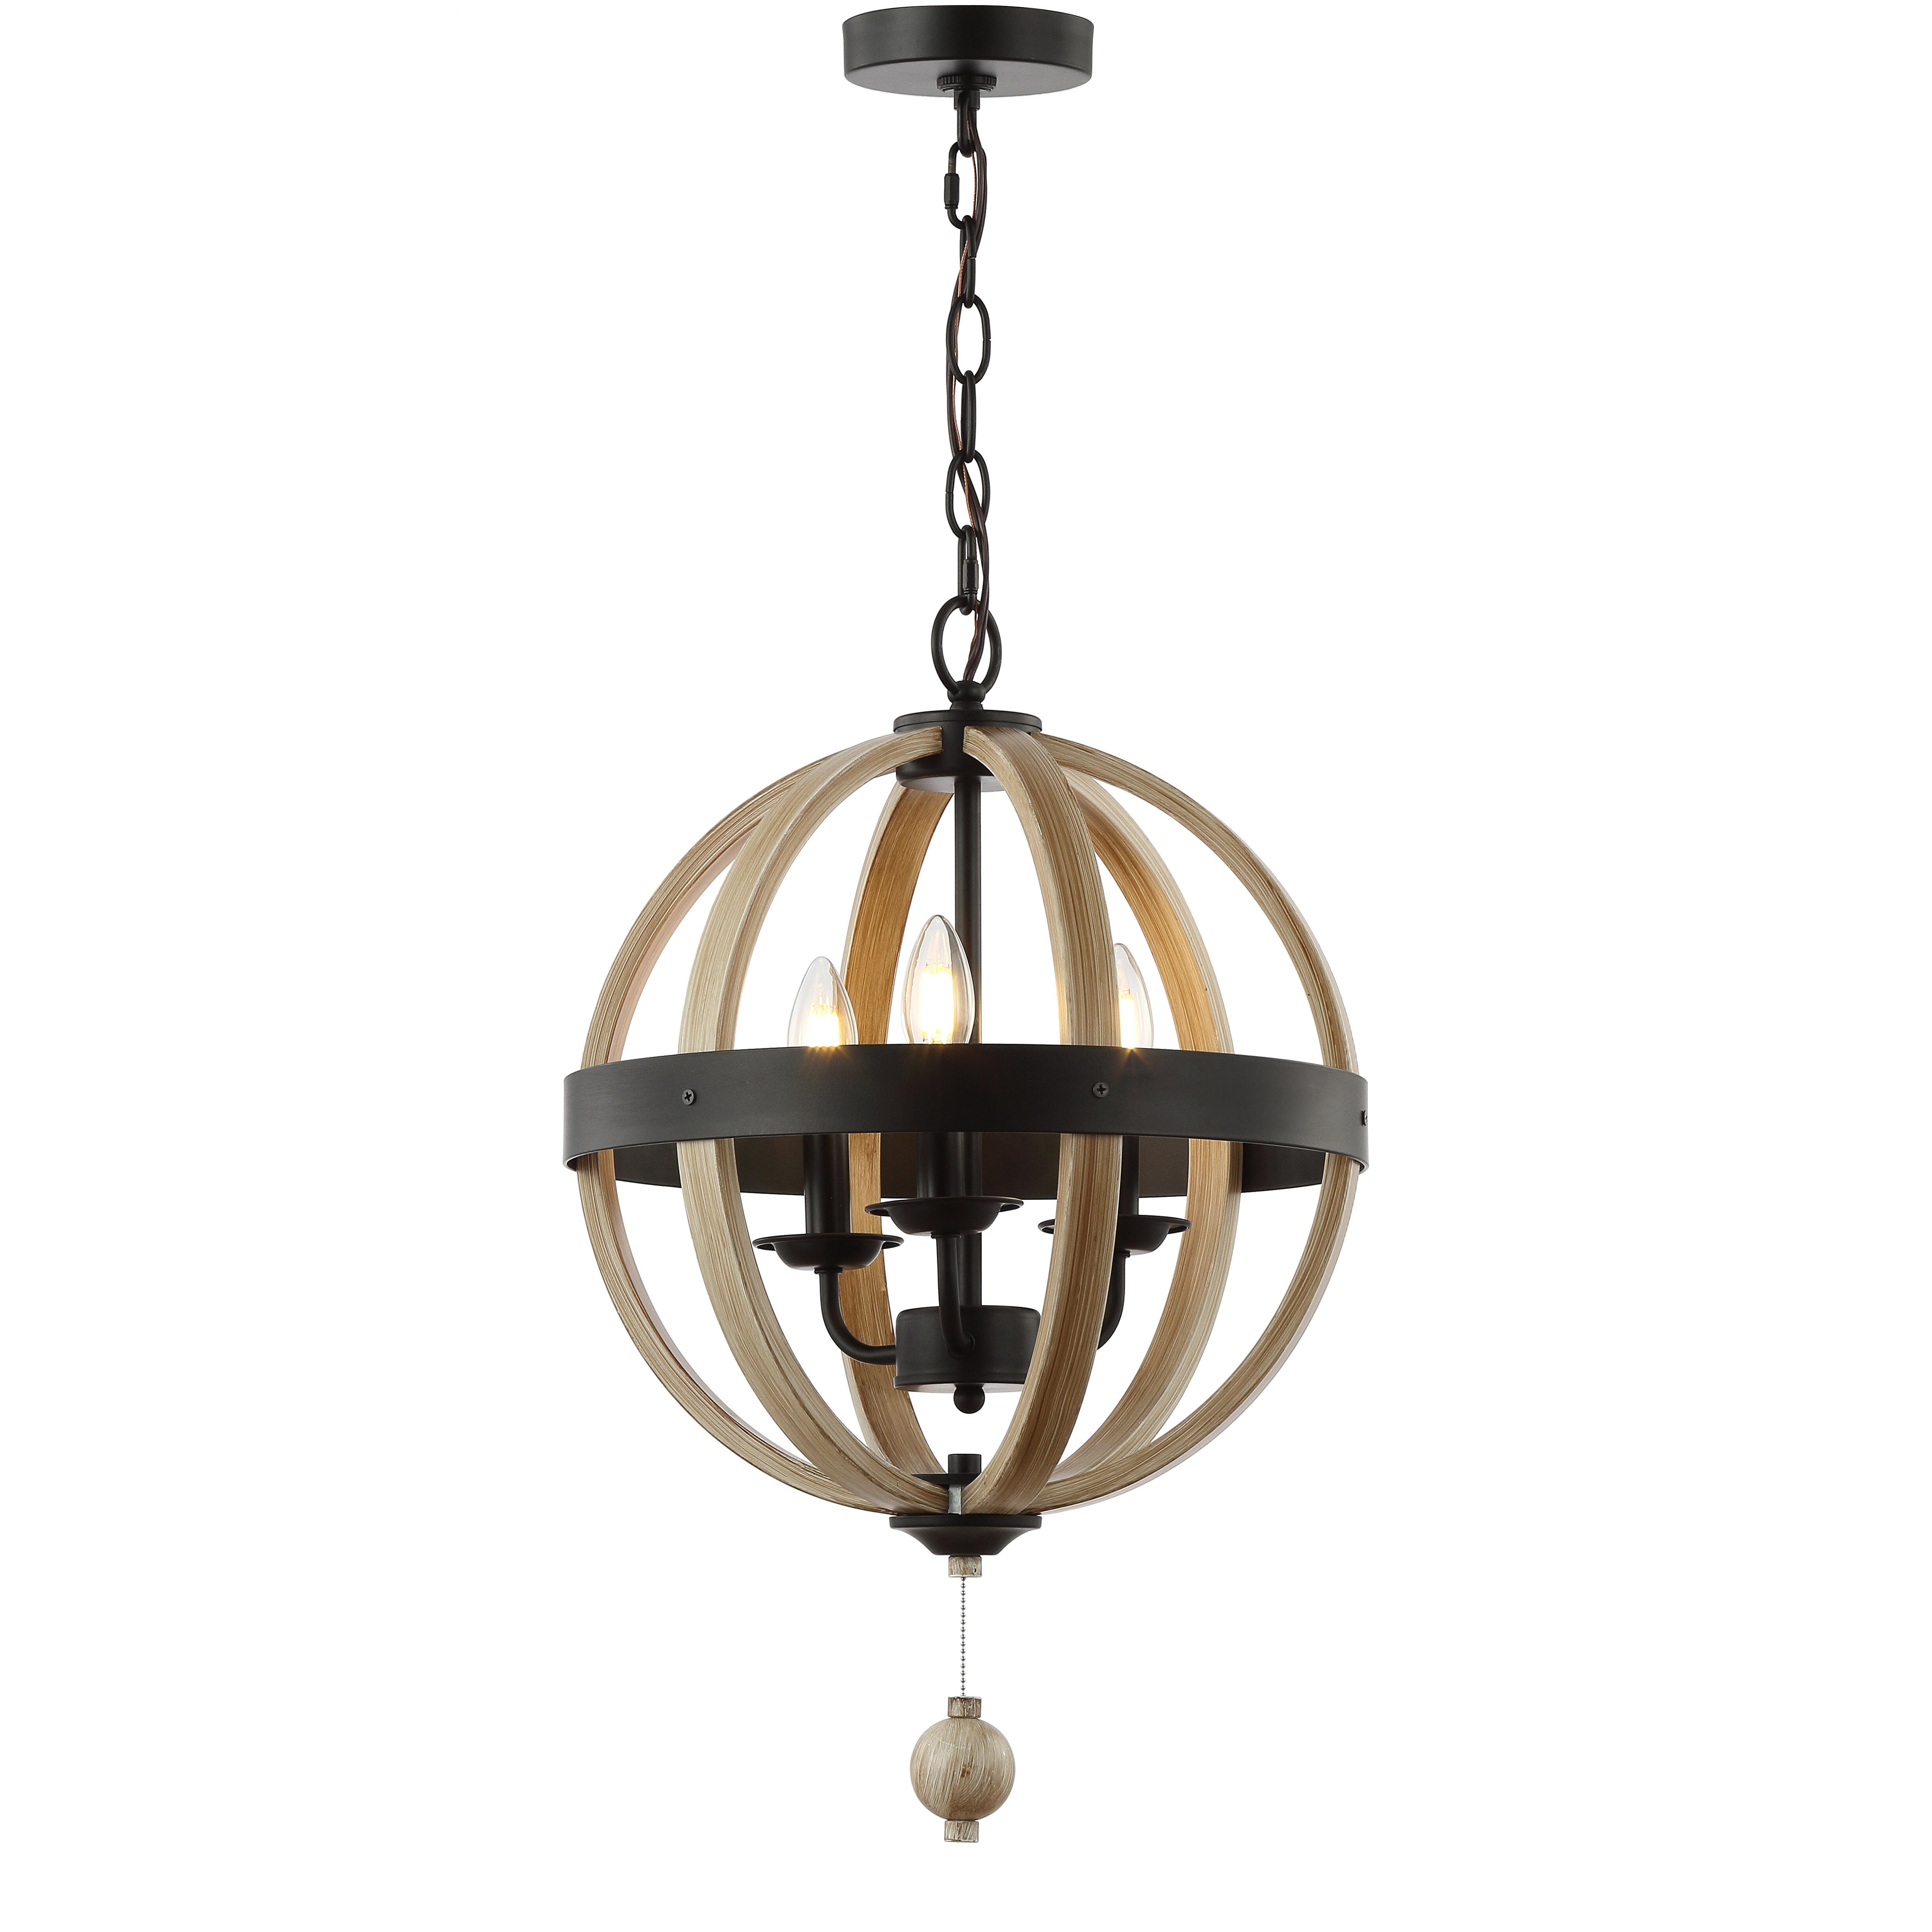 Well Known La Barge 3 Light Globe Chandeliers With Regard To Cauthen 3 Light Globe Chandelier (View 4 of 25)